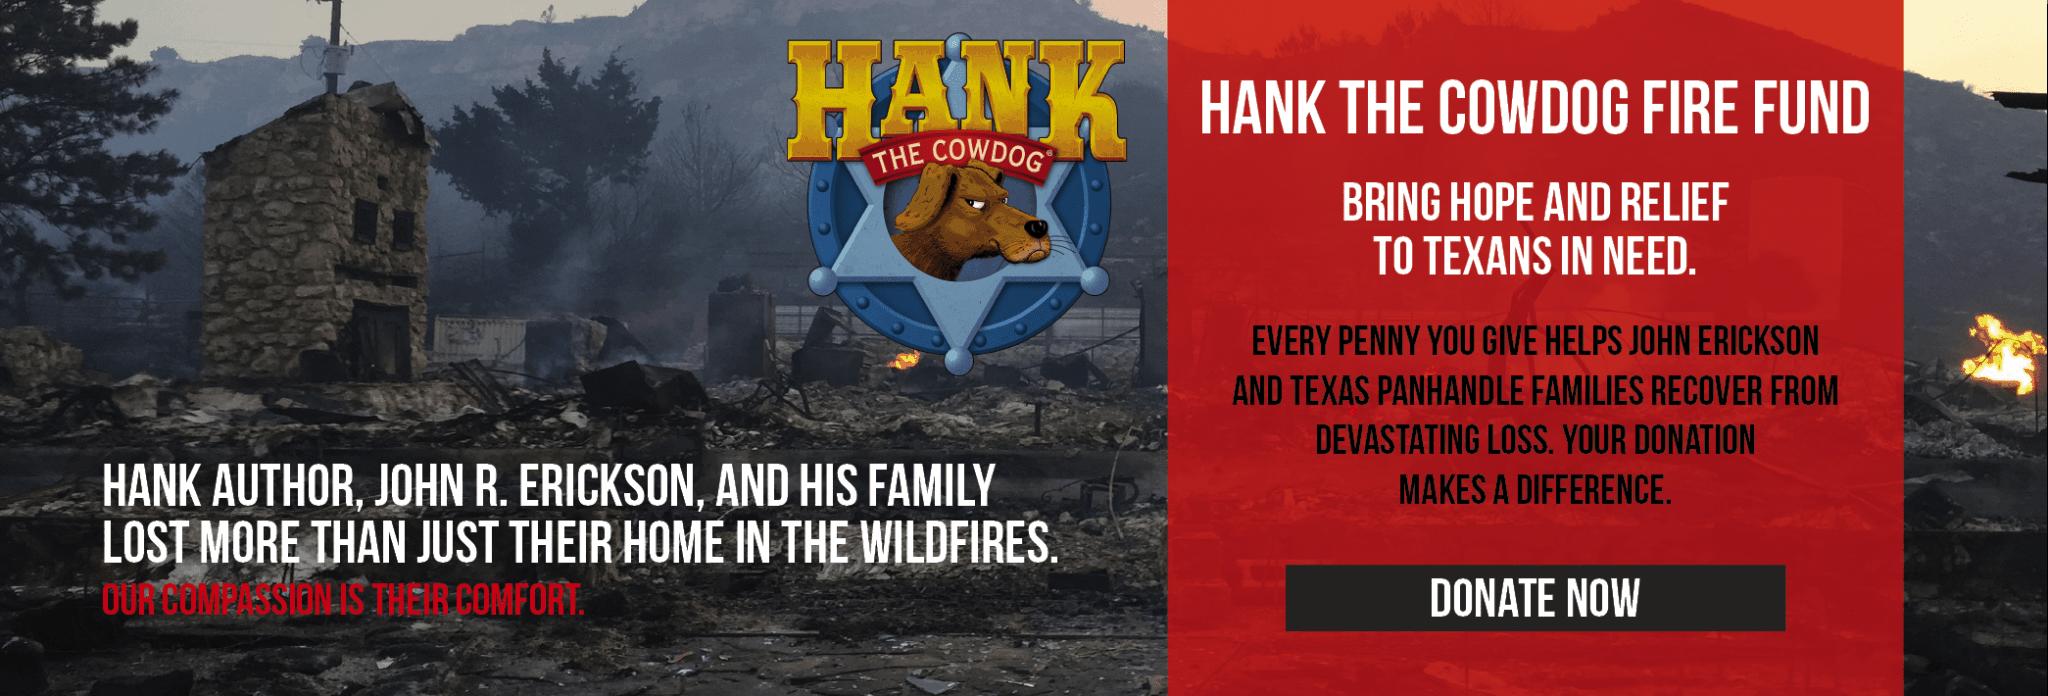 Help Hank